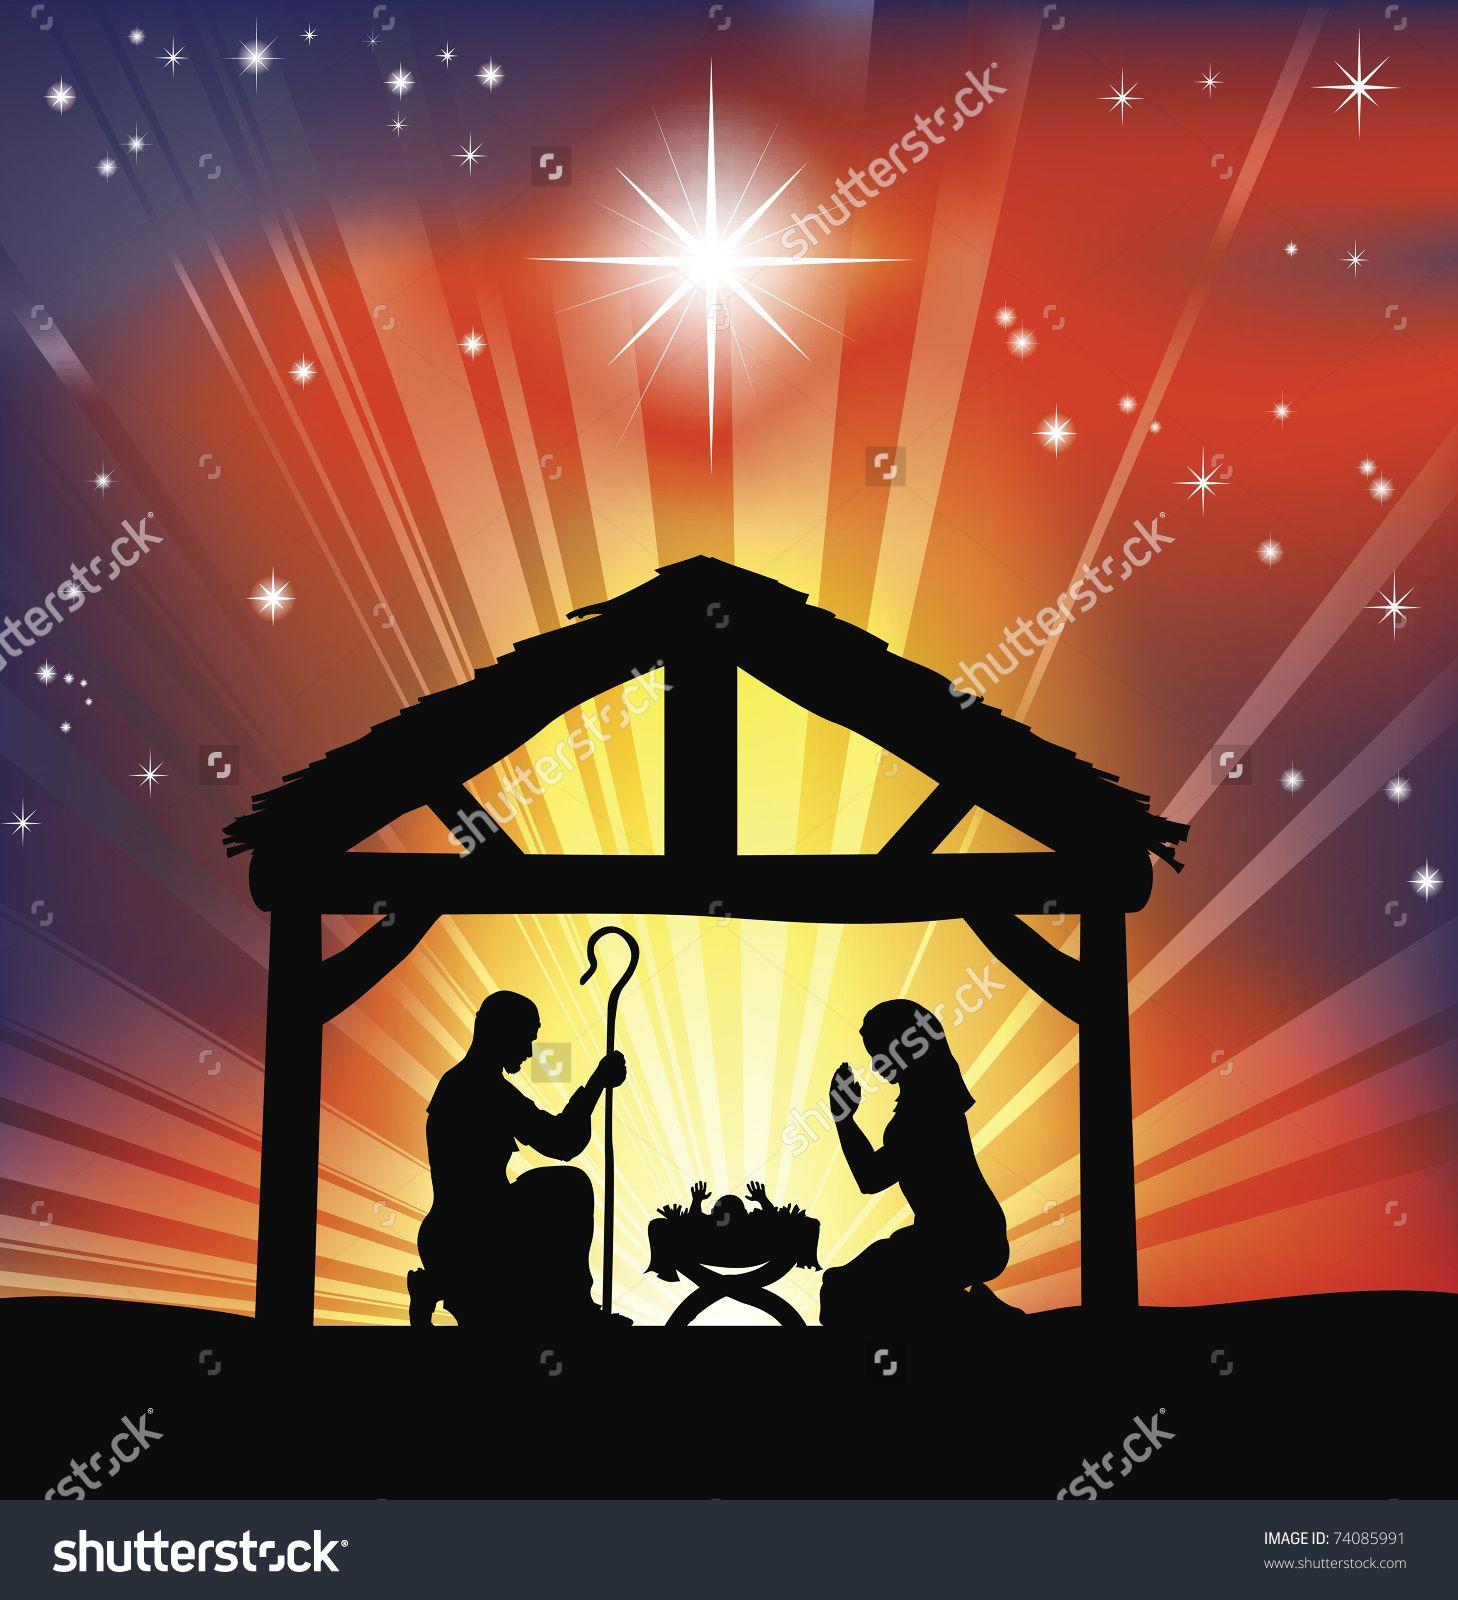 beautiful christian christmas cards - Google Search